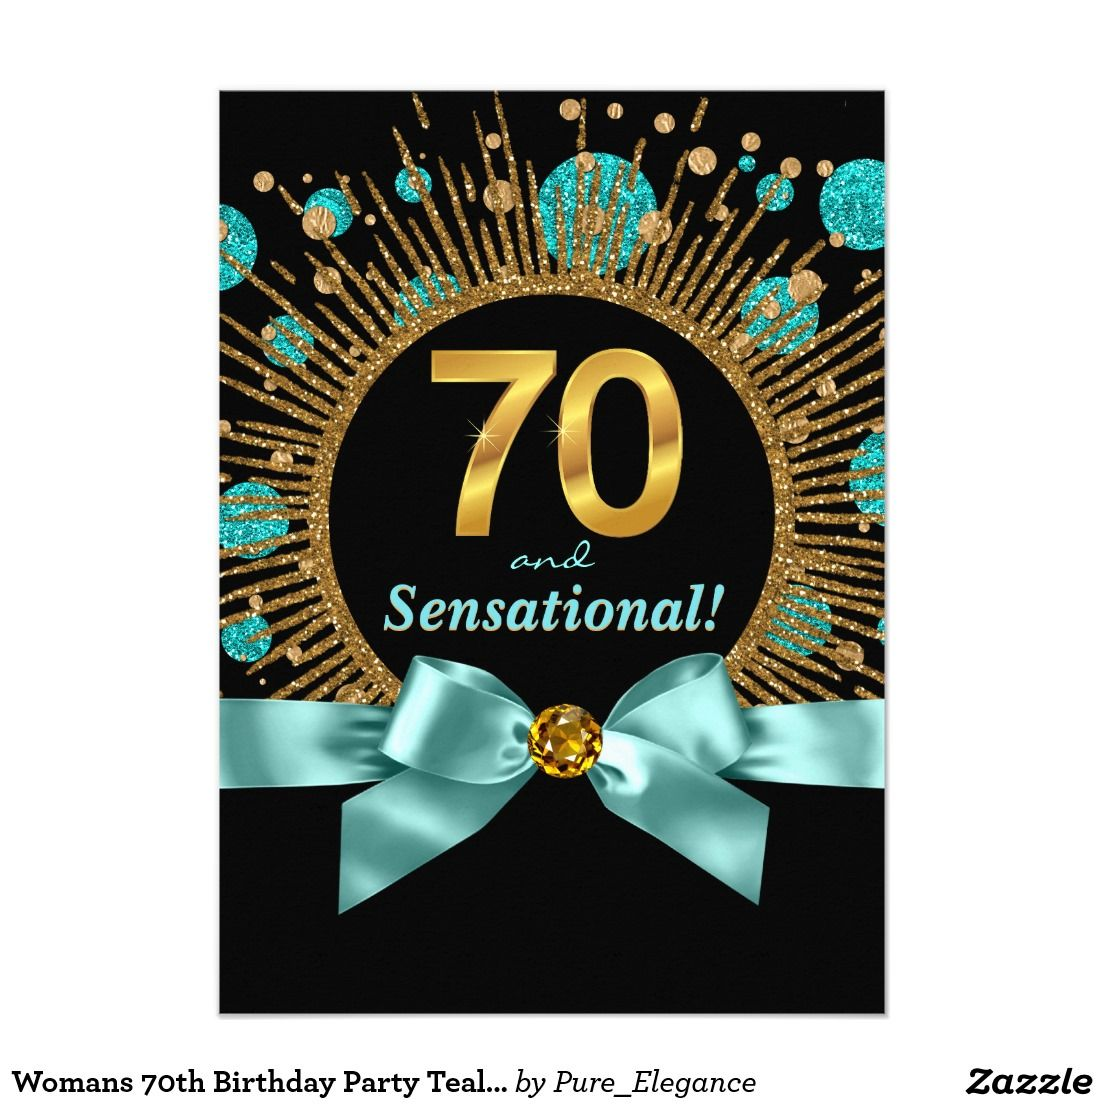 Medium Crop Of 70th Birthday Party Ideas